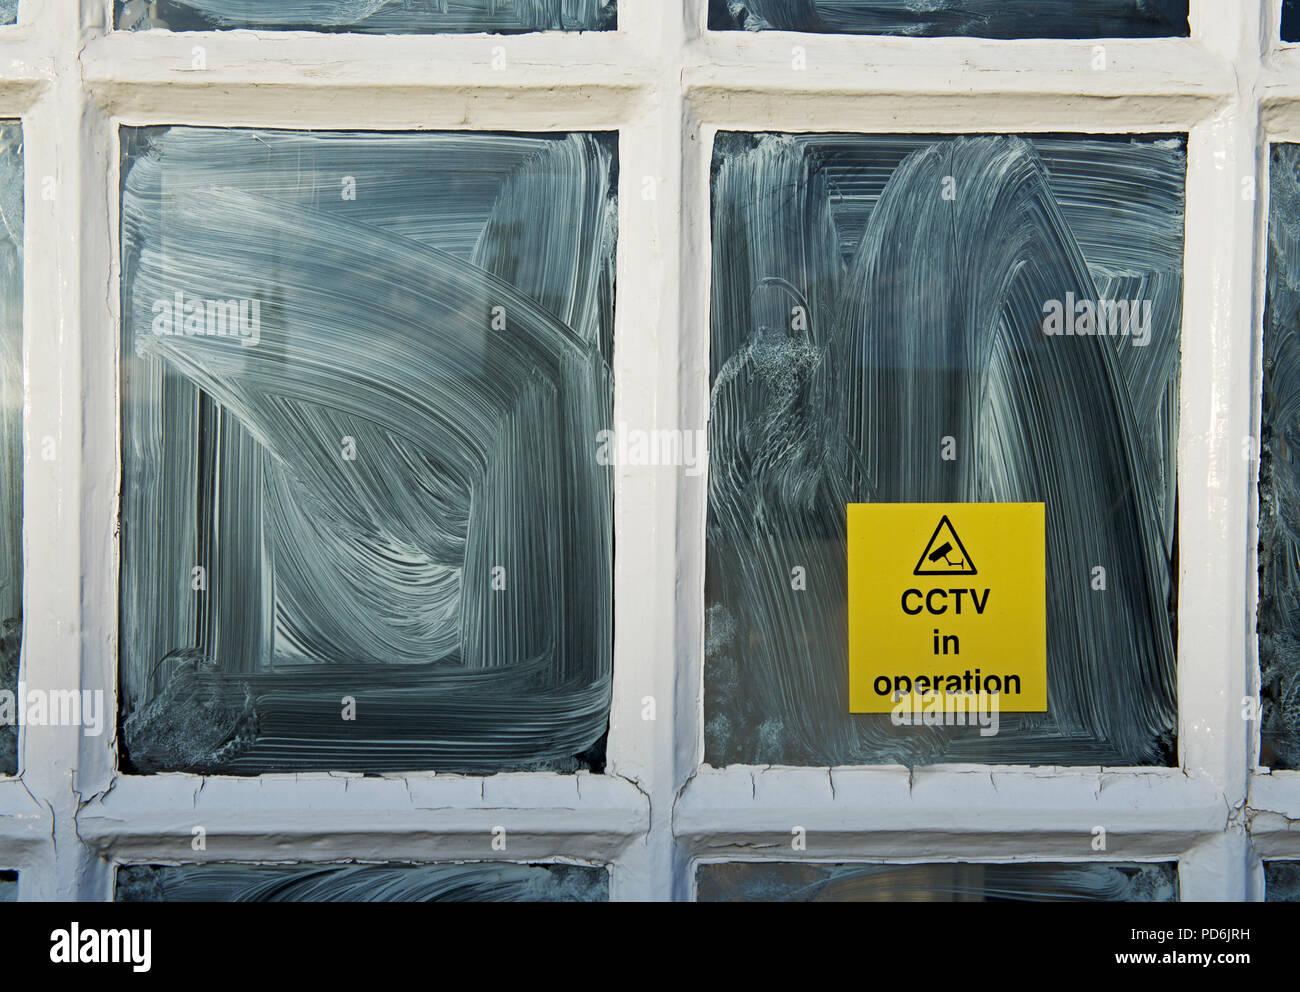 Sign - CCTV in operation - on shop window, England UK - Stock Image